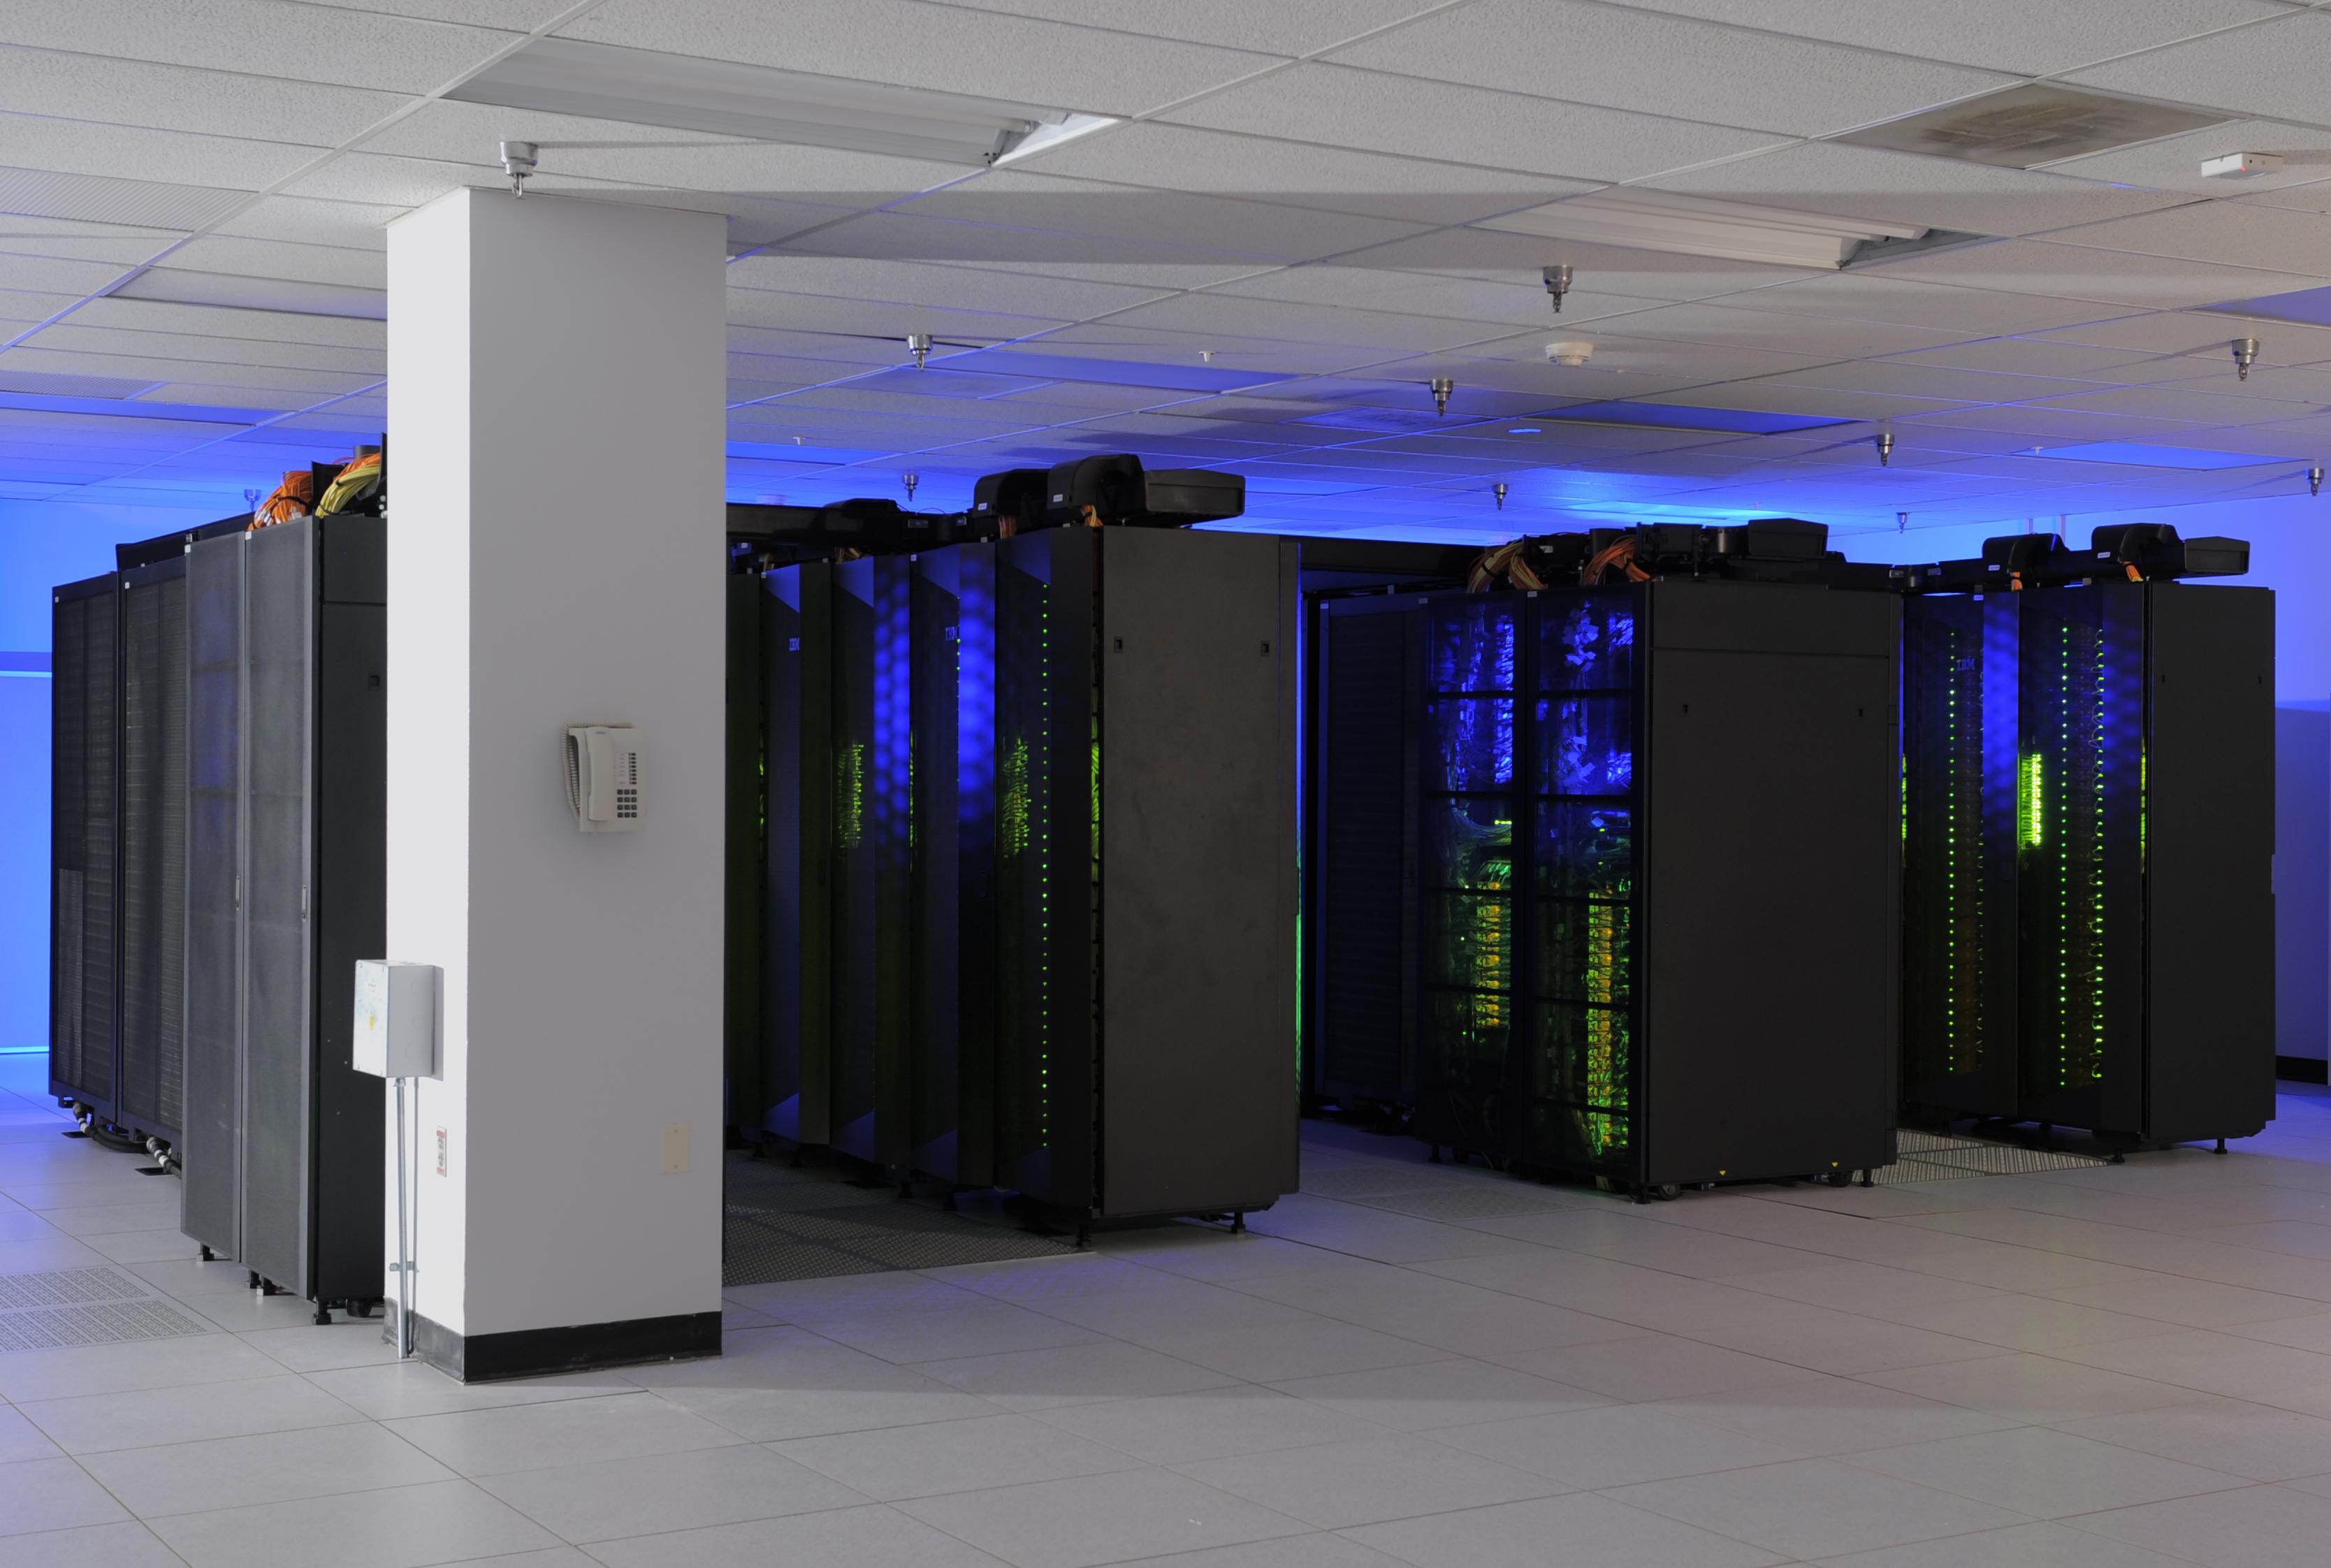 Titan supercomputer screen